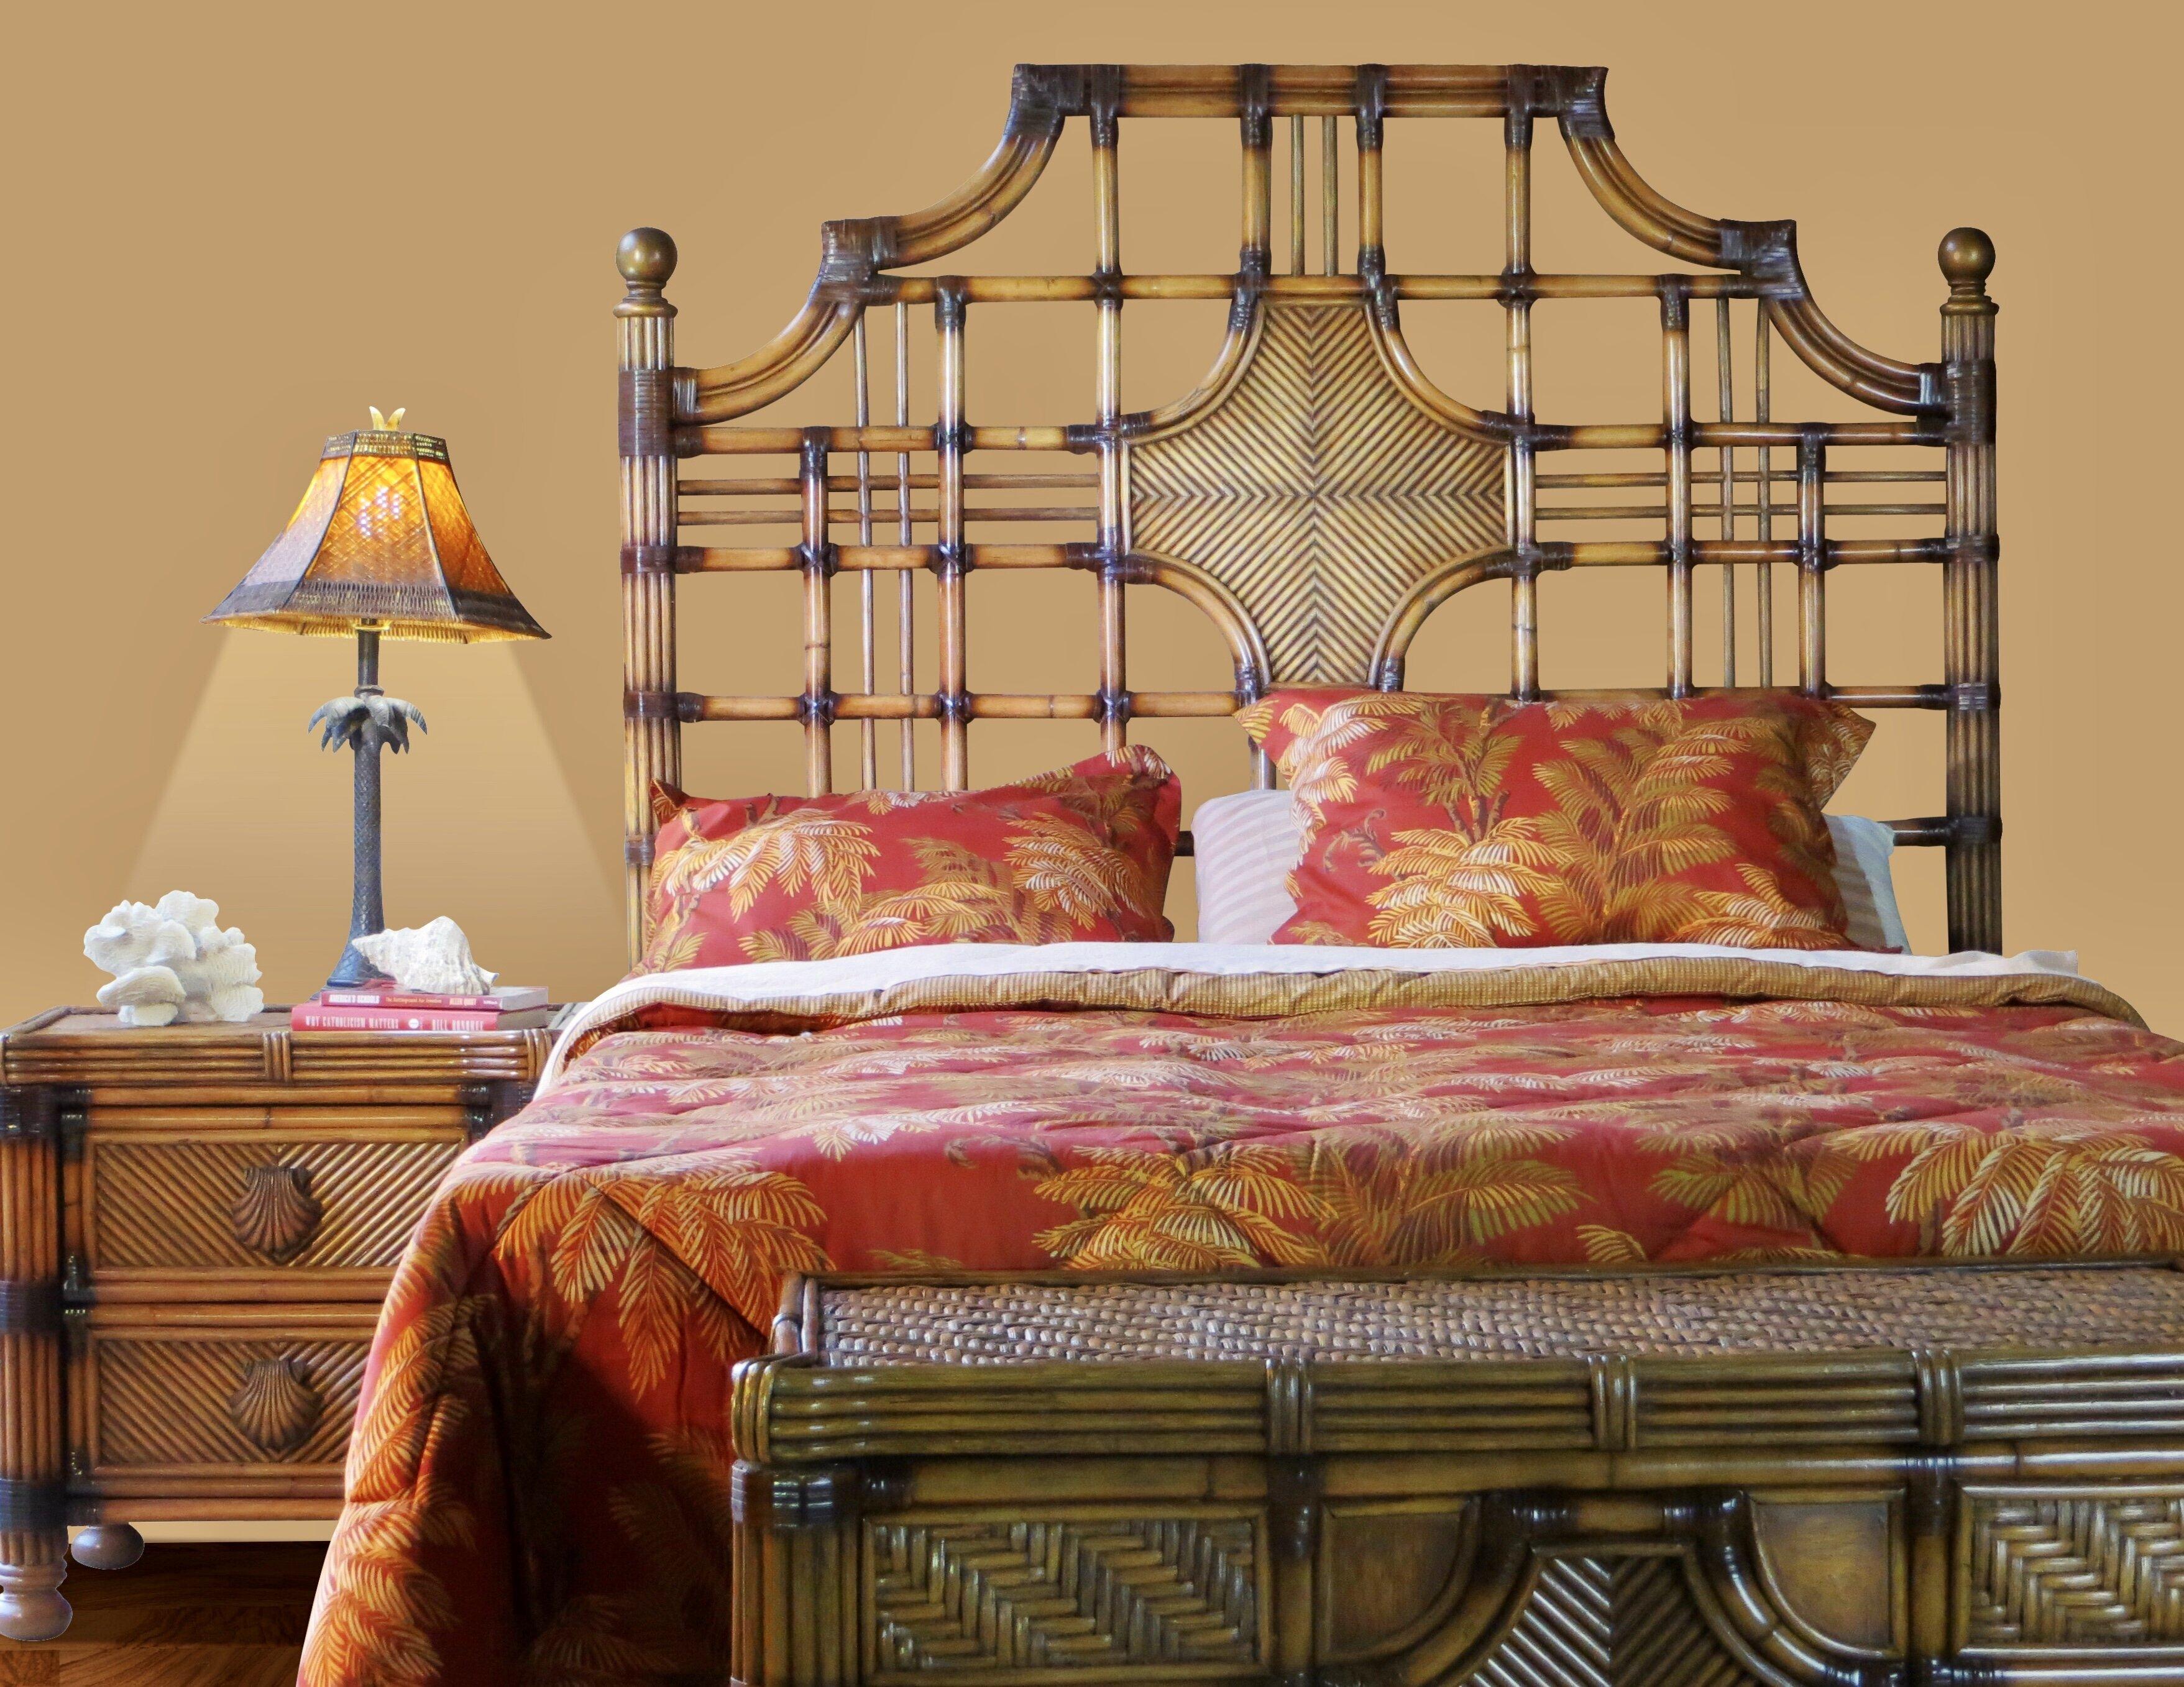 Wicker Rattan Bedroom Sets You Ll Love In 2021 Wayfair